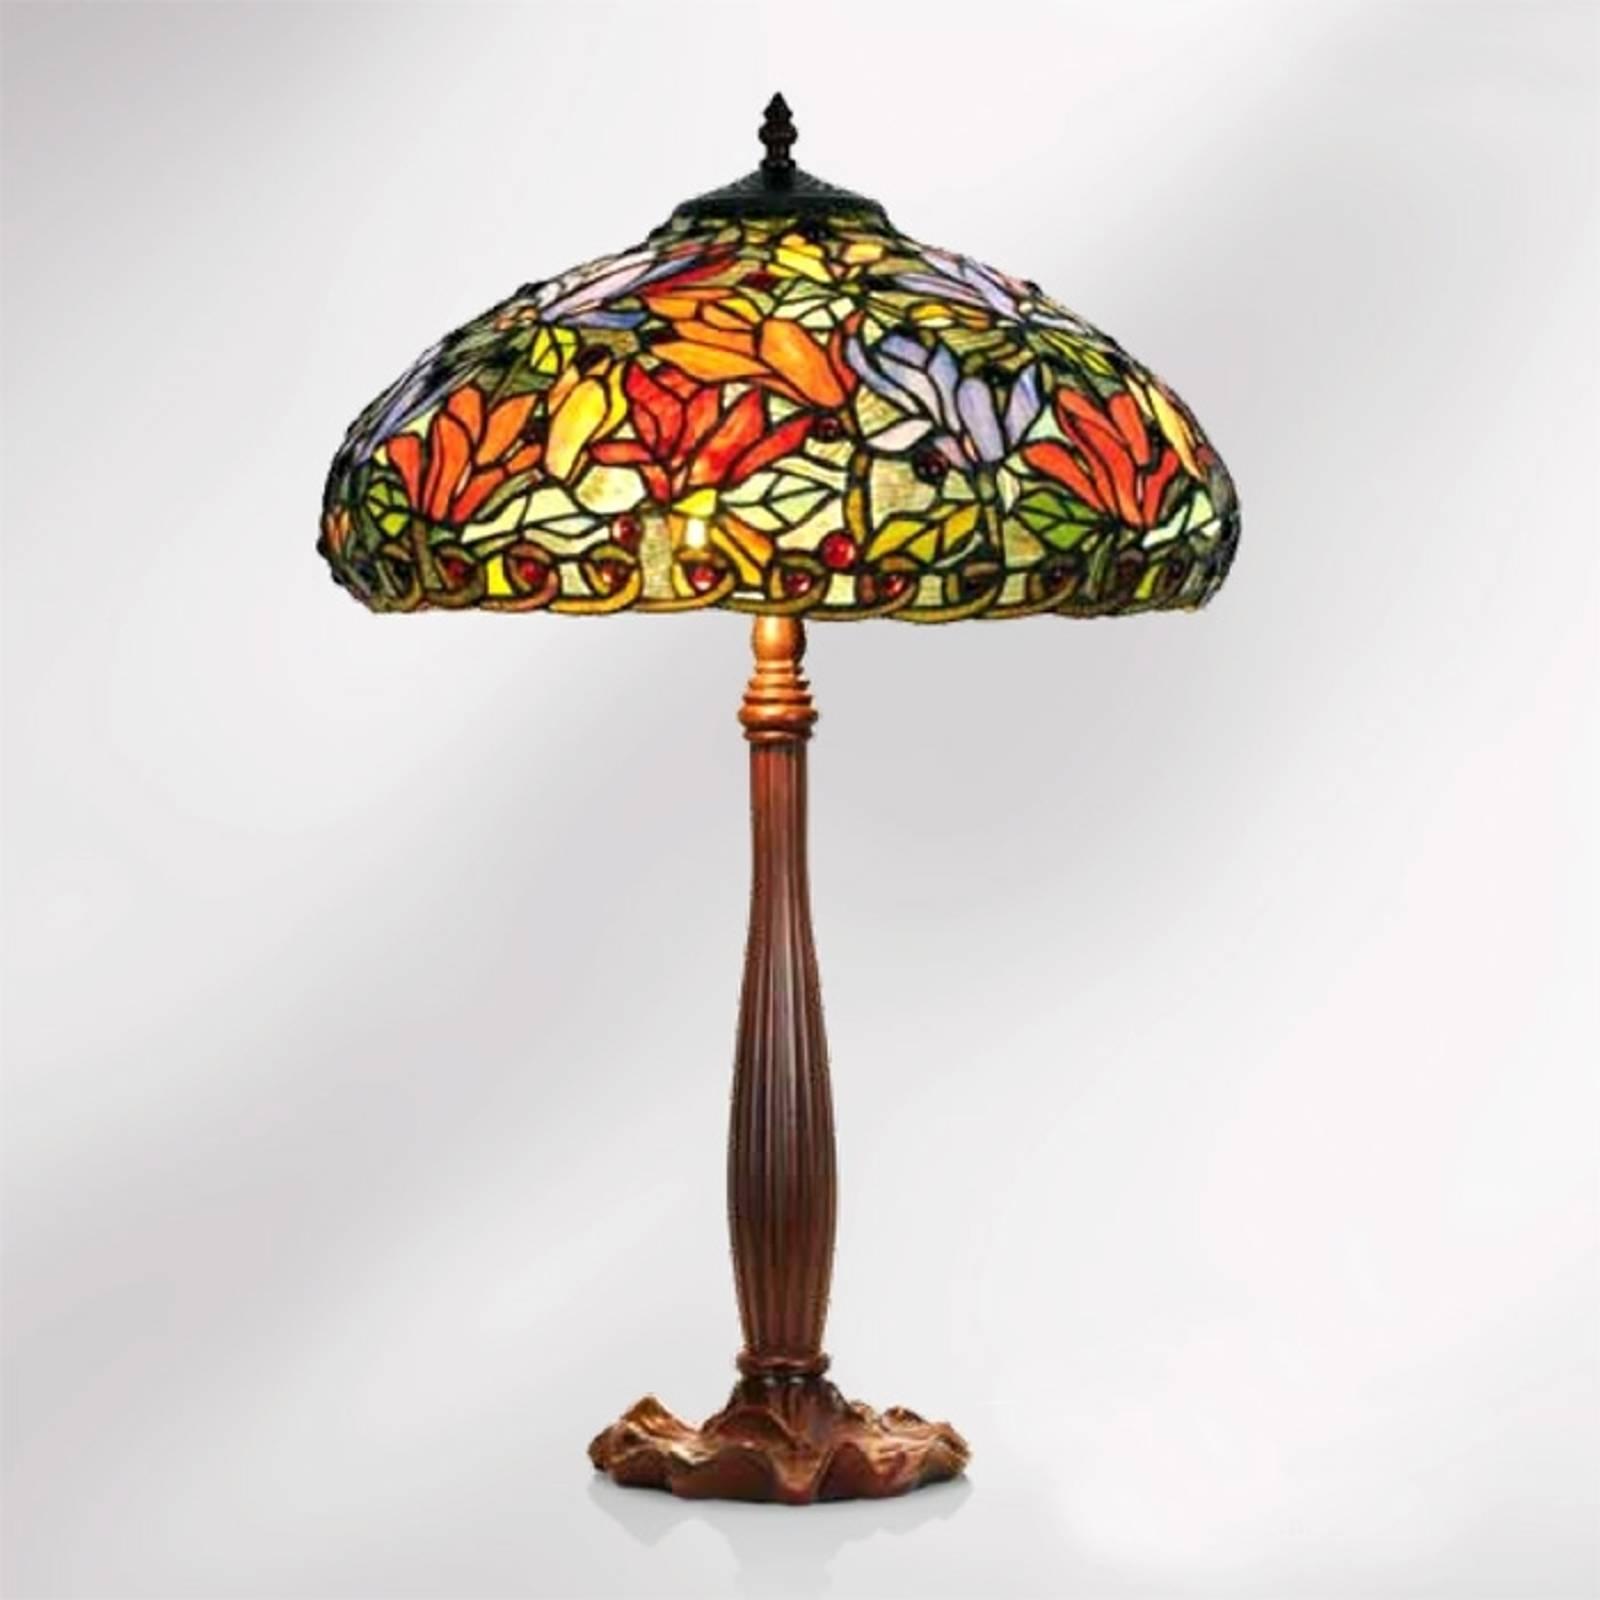 Tafellamp Elaine bloemrijke Tiffany-stijl 64 cm